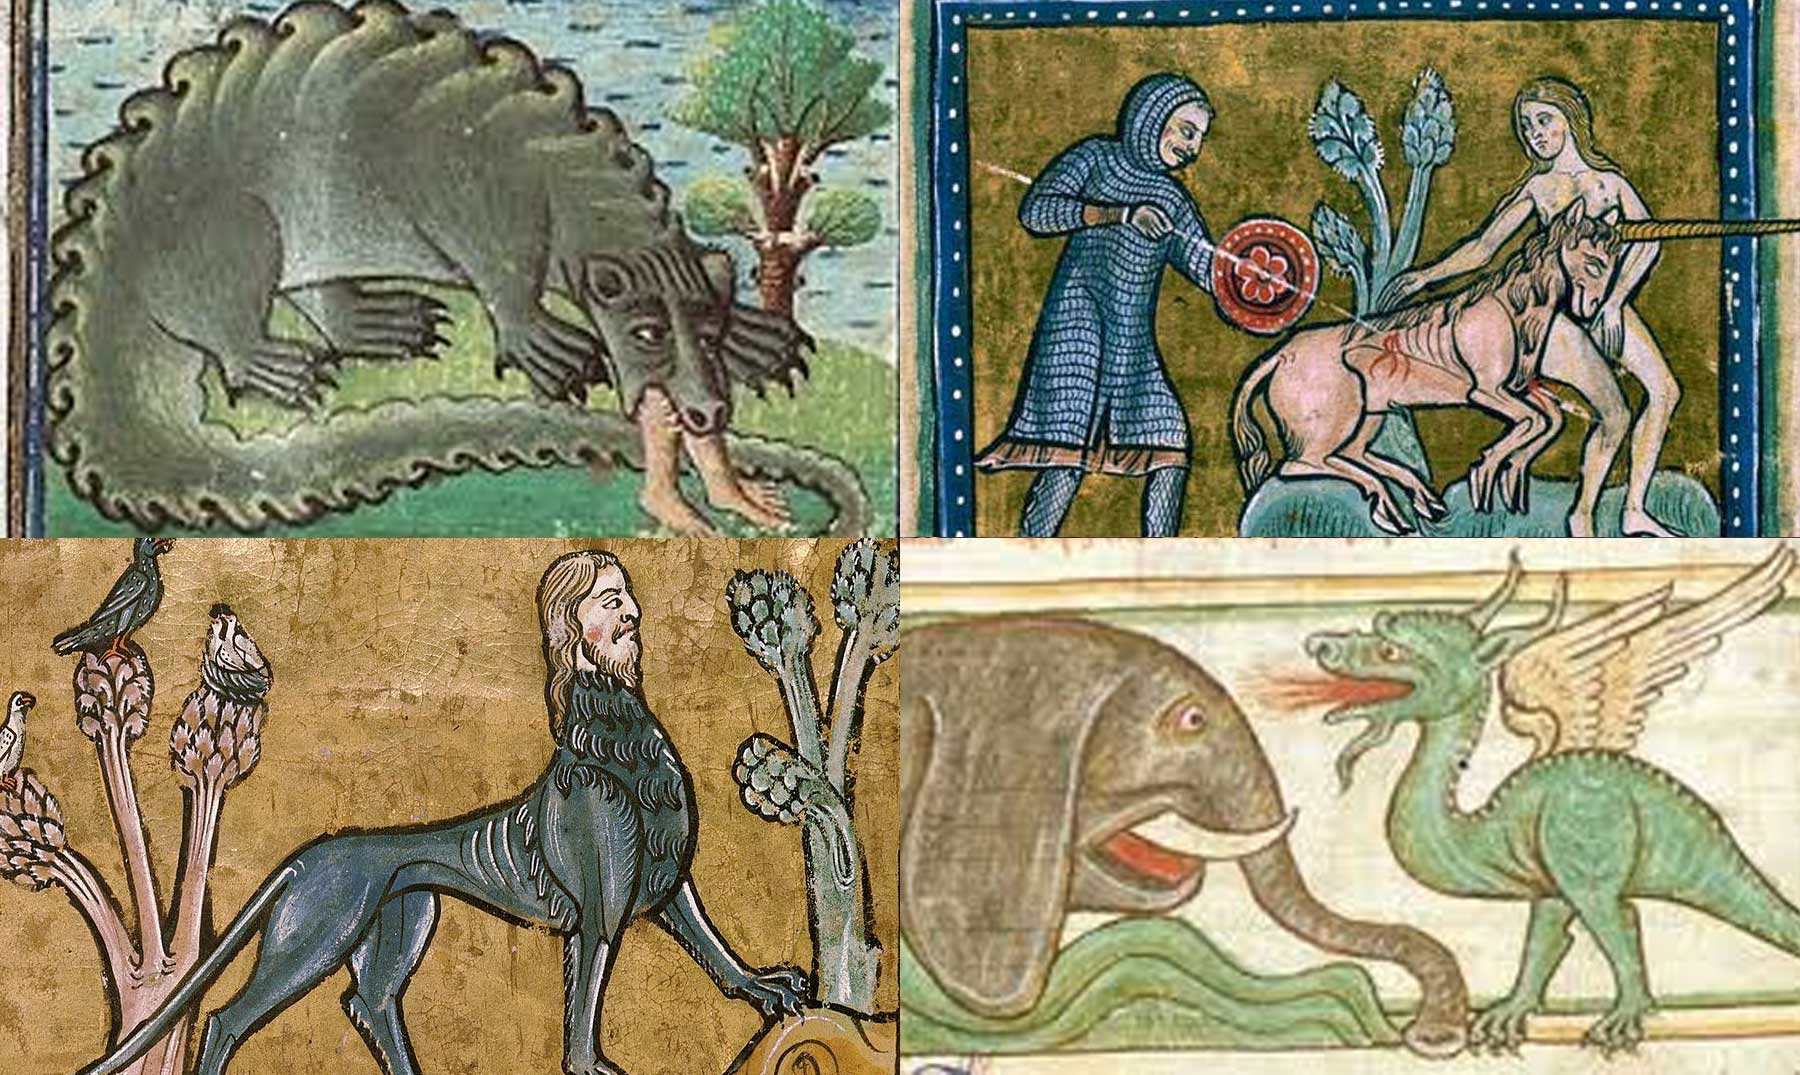 Ebook Bestiario Medieval as PDF Download Portable Document Format